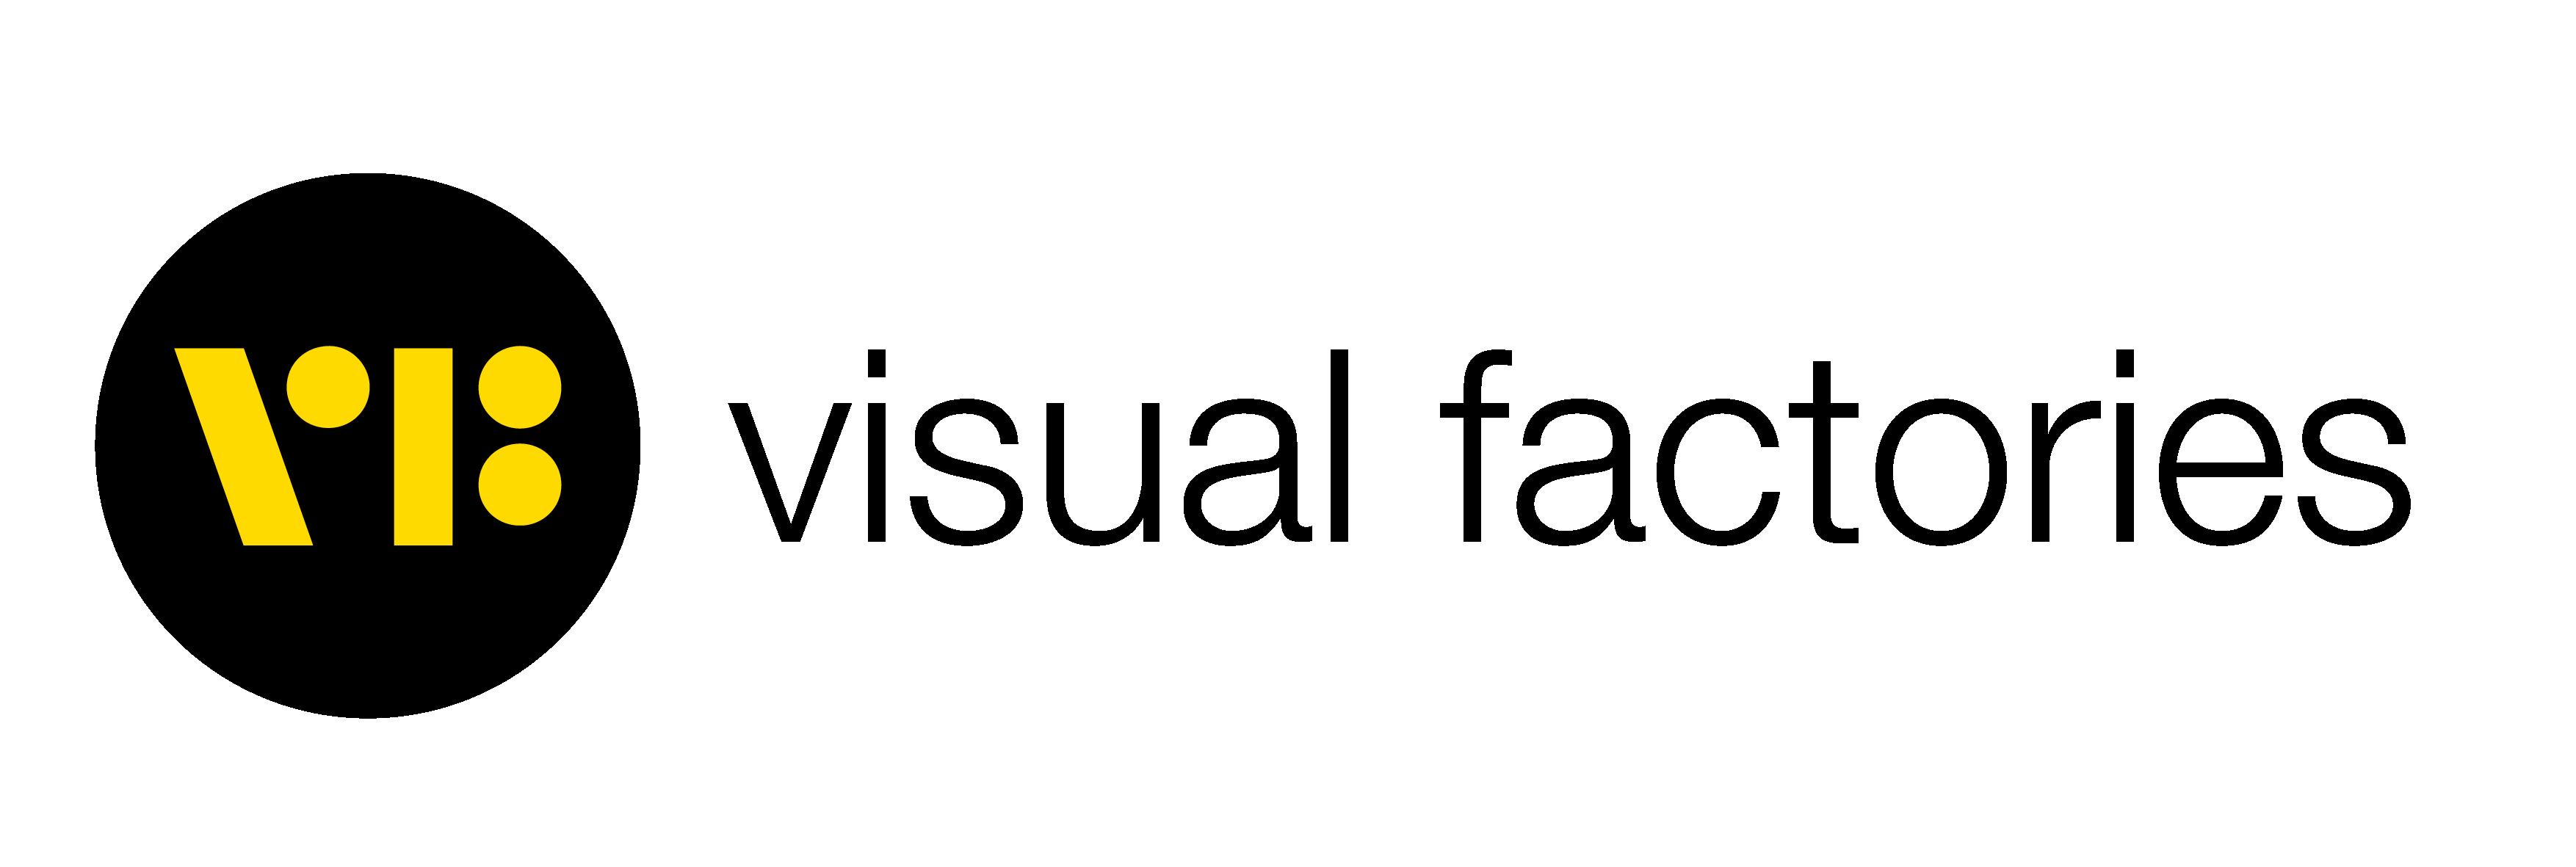 VISUAL FACTORIES logo